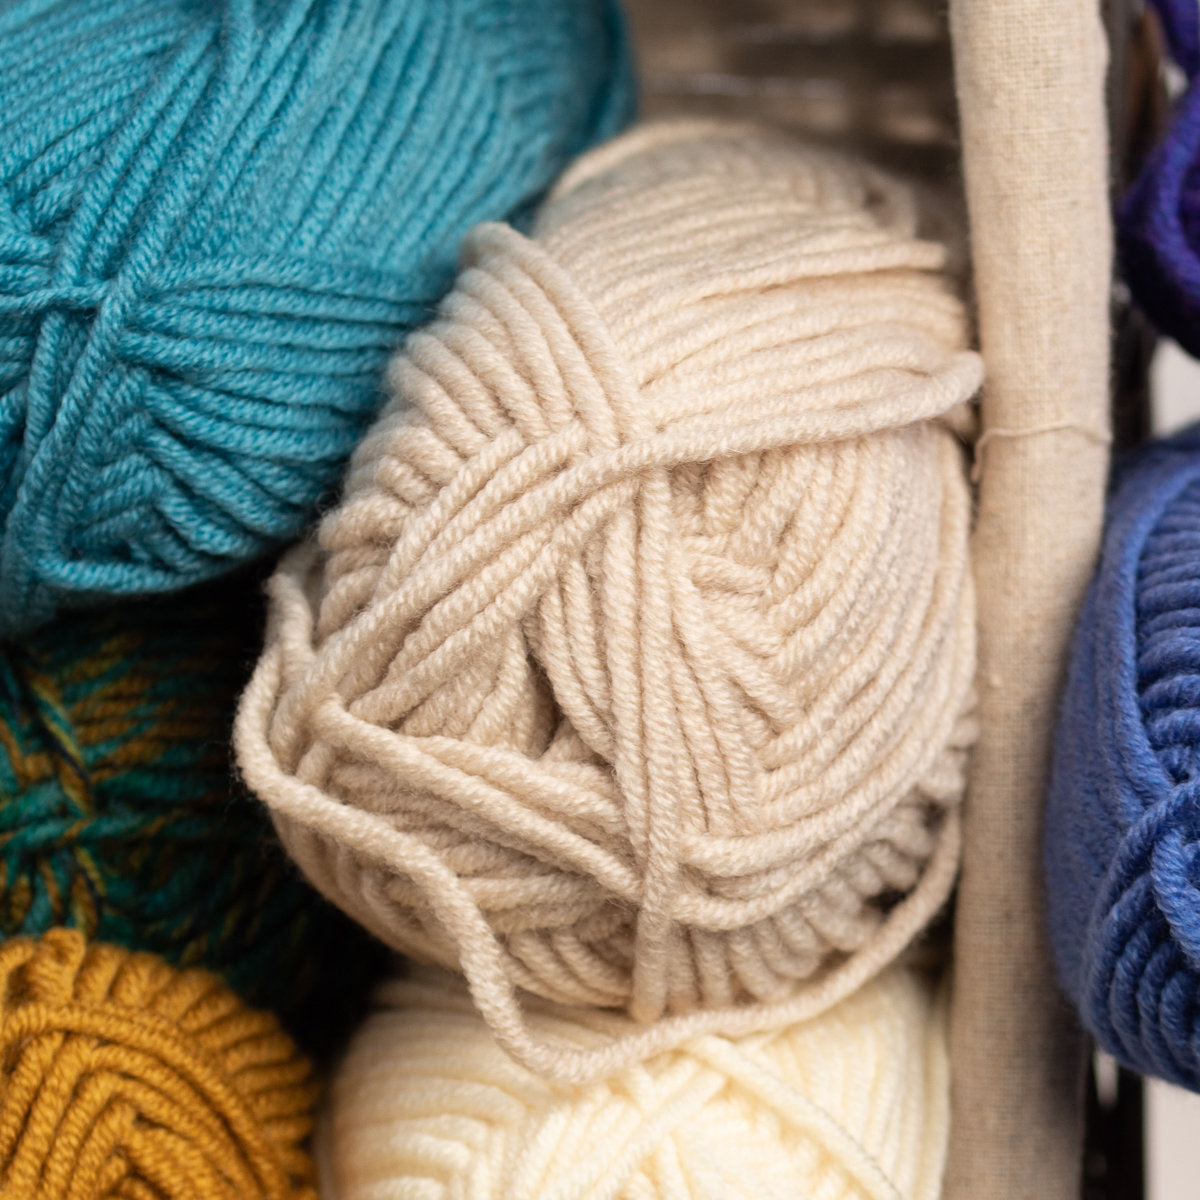 3pk-Lion-Brand-Woolspun-Acrylic-amp-Wool-Yarn-Bulky-5-Knit-Crocheting-Skeins-Soft thumbnail 46